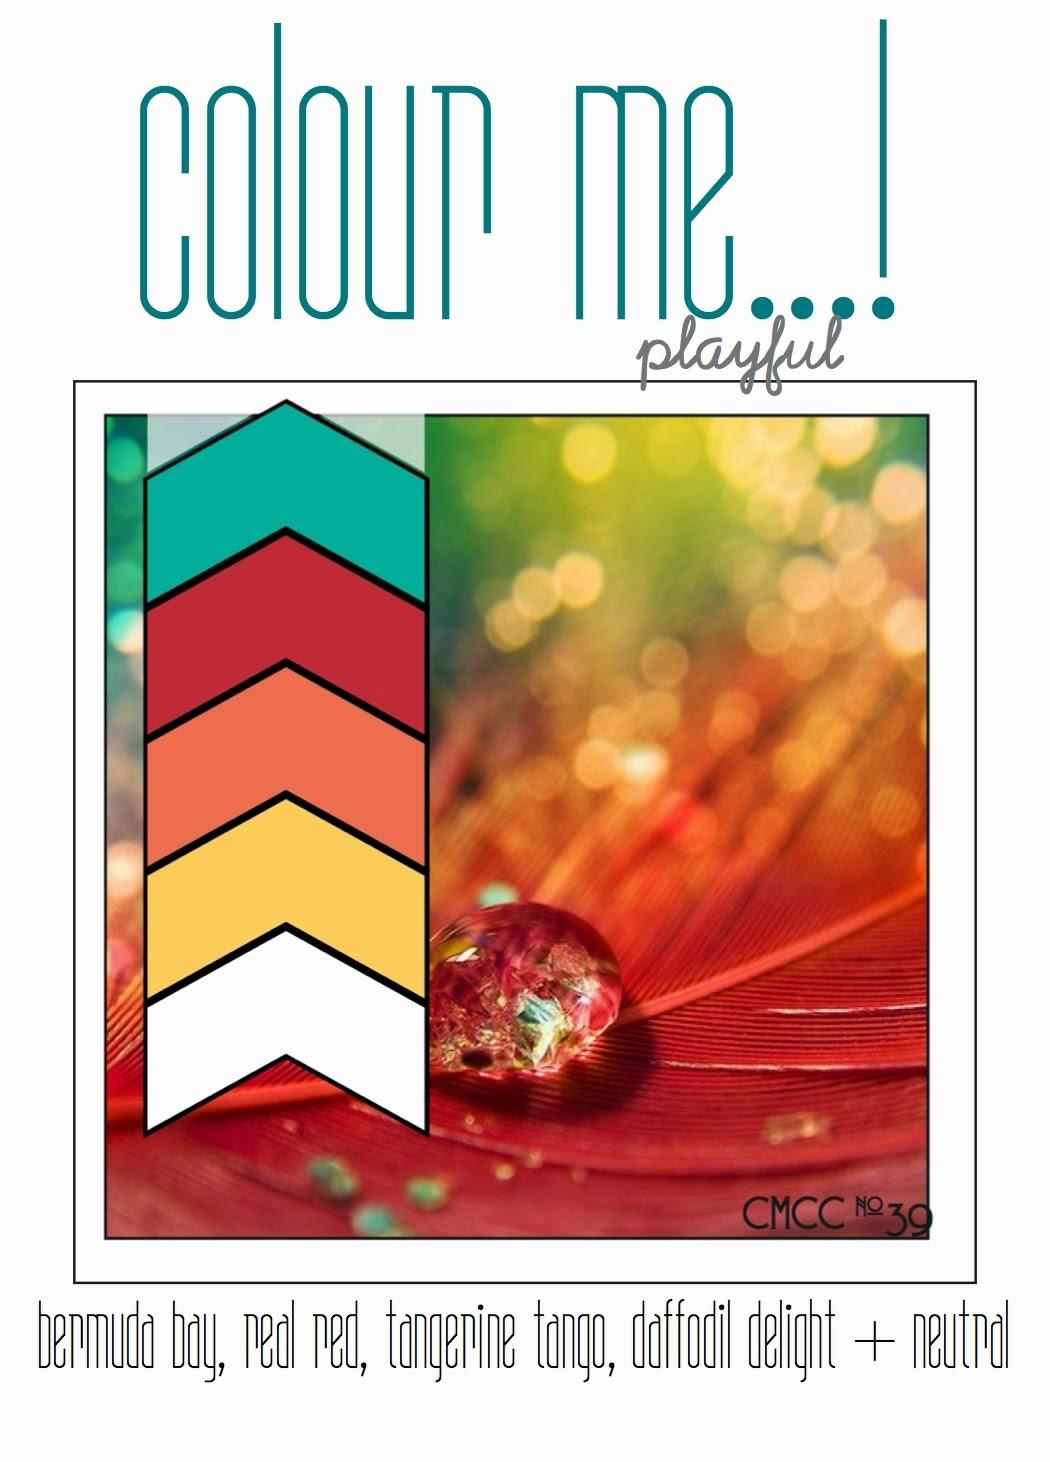 http://colourmecardchallenge.blogspot.com/2014/09/cmcc39-colour-me-playful.html?utm_source=feedburner&utm_medium=email&utm_campaign=Feed%3A+blogspot%2FLMPiB+%28Colour+Me...%21%29